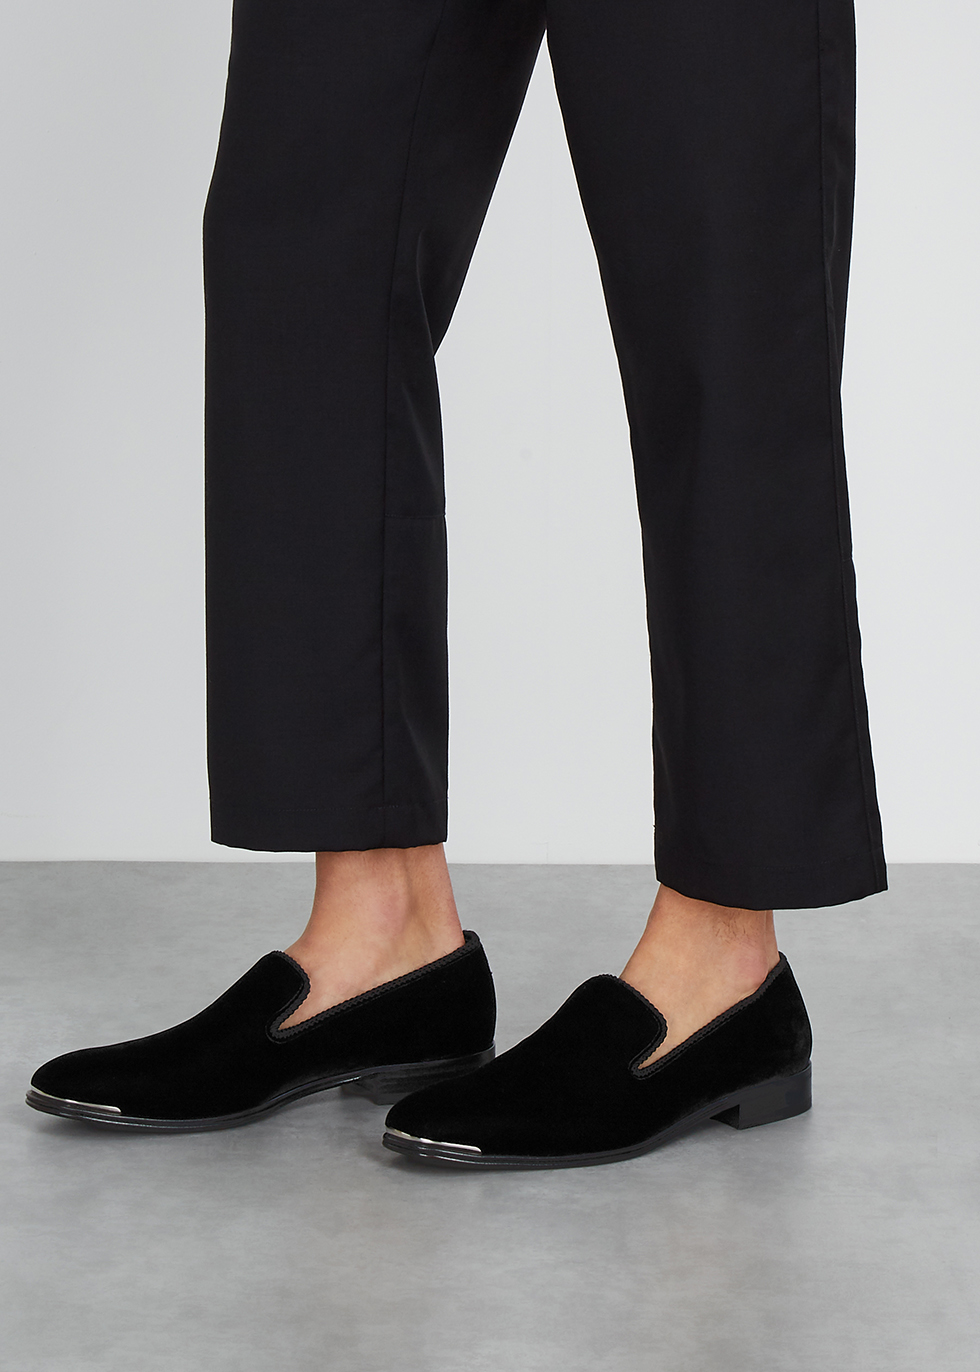 Alexander McQueen Black velvet loafers